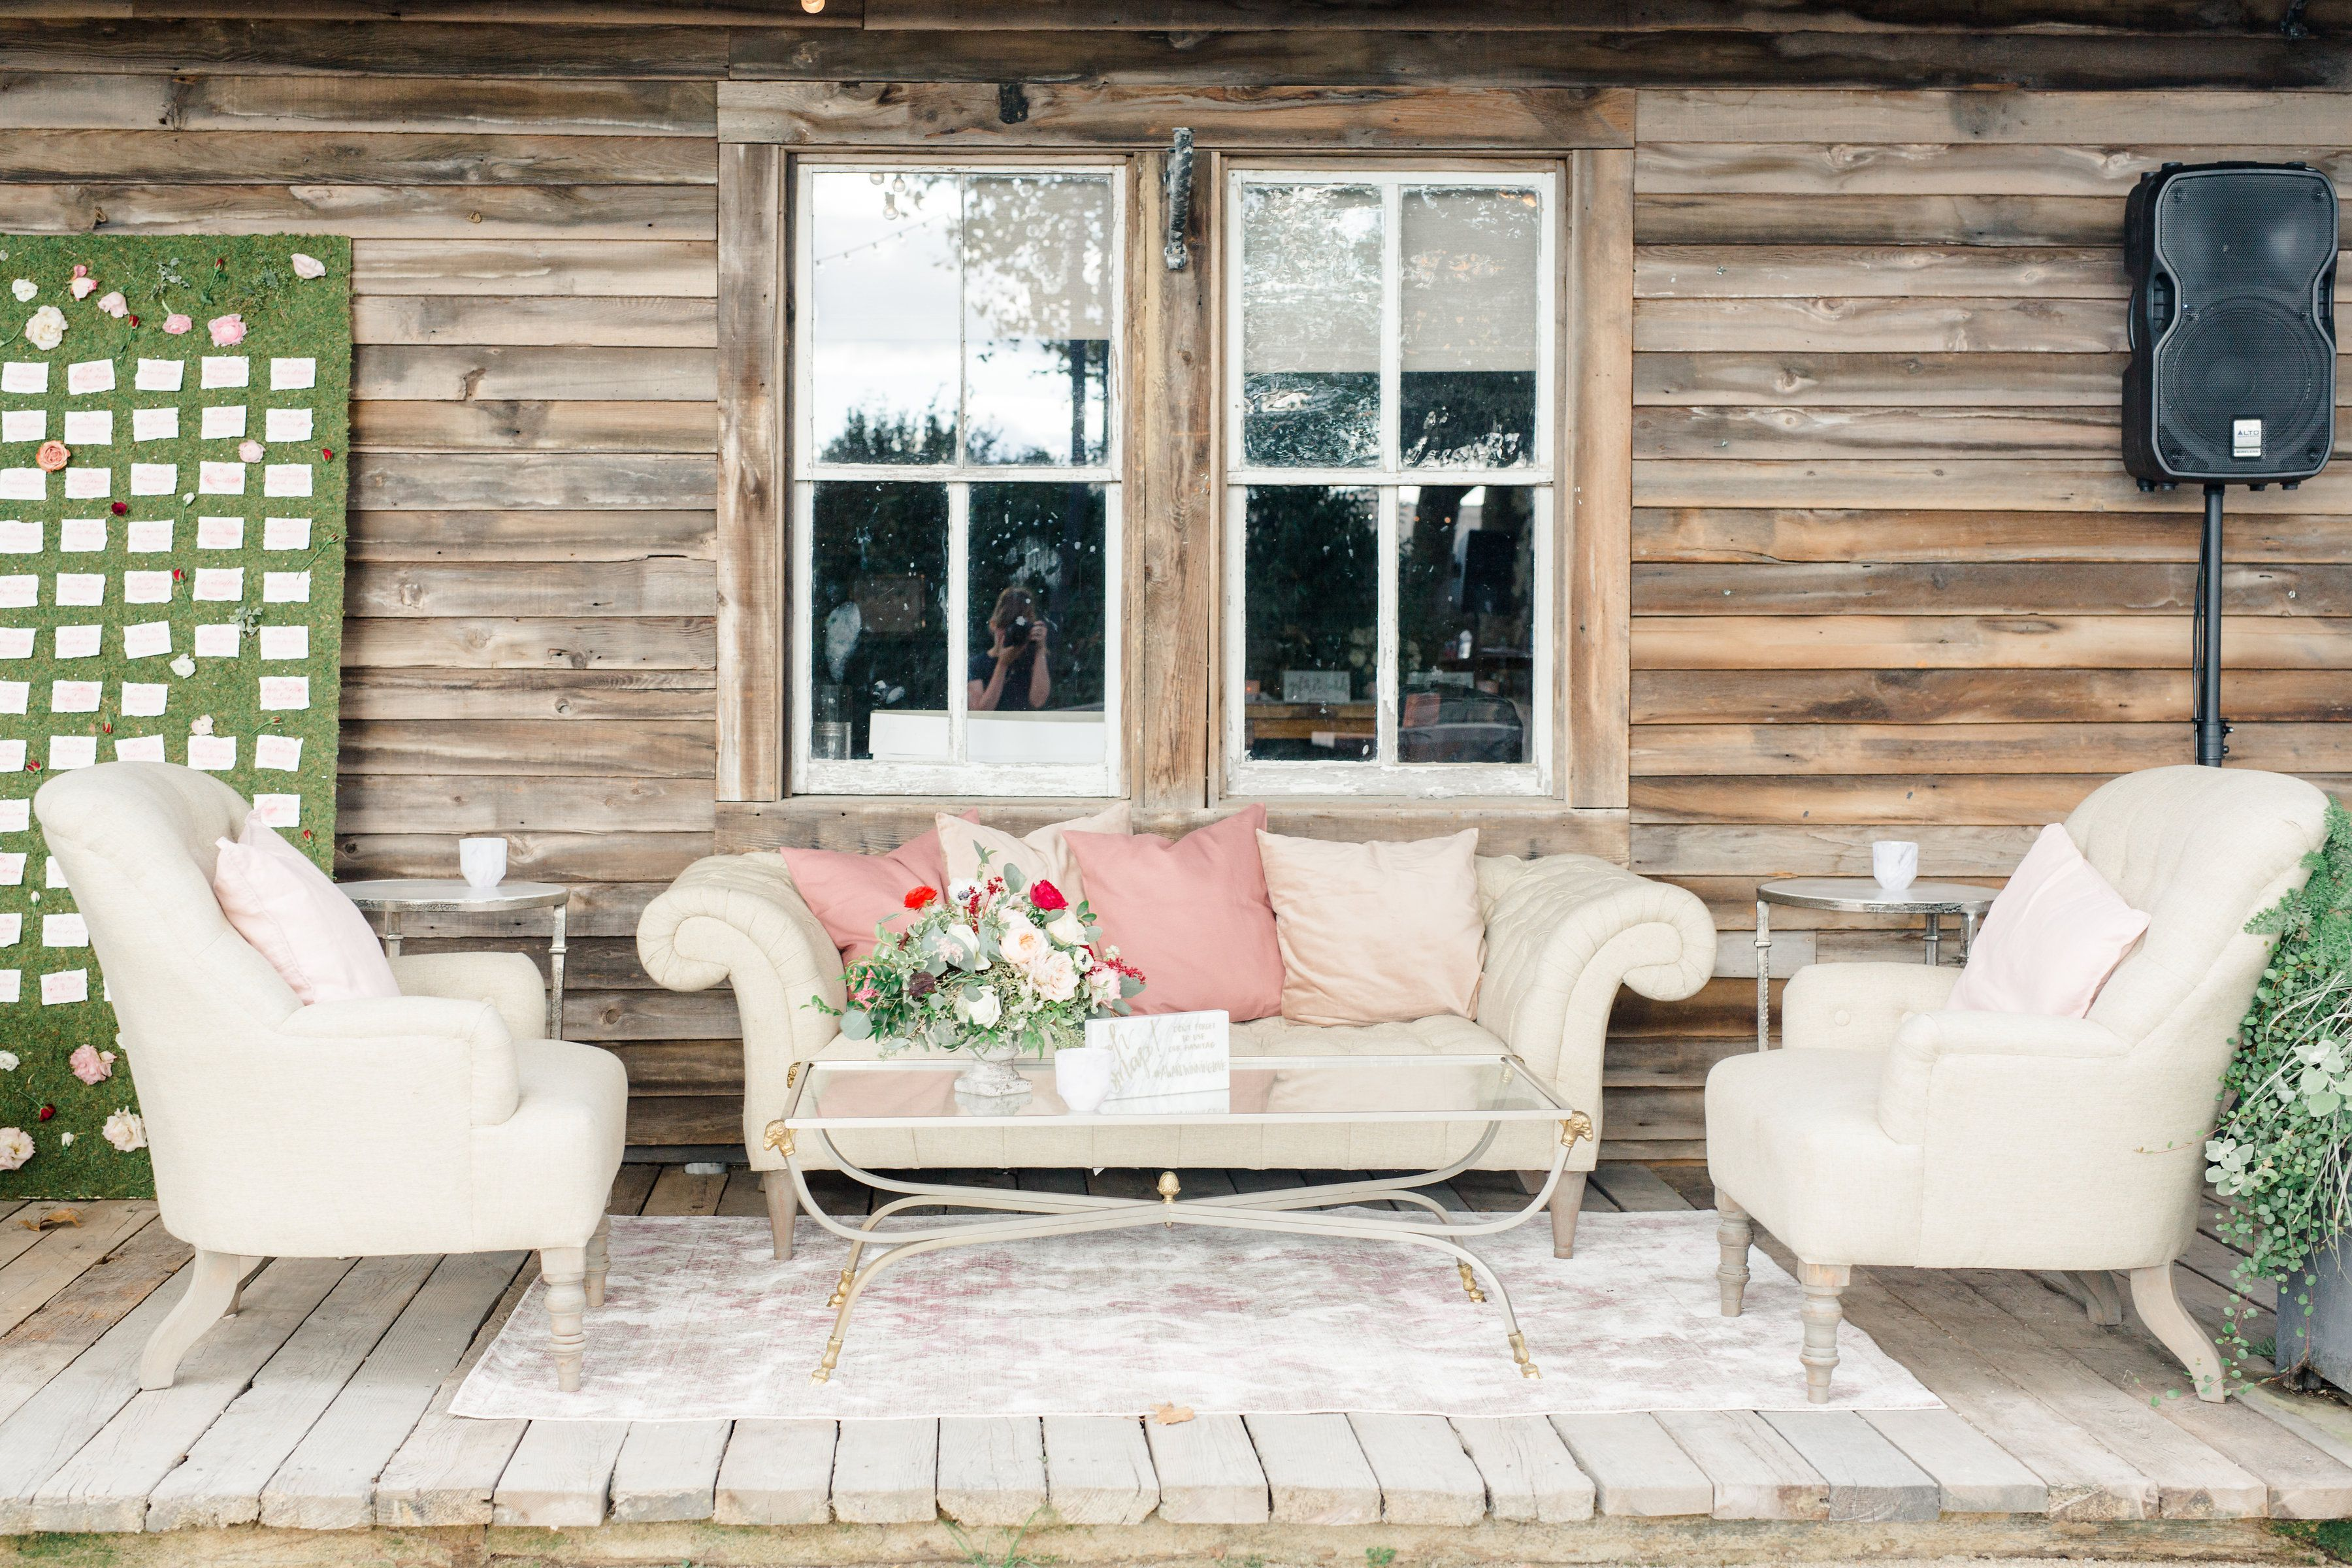 garden wedding lounge inspiration at terrain garden and cafe in rh nl pinterest com